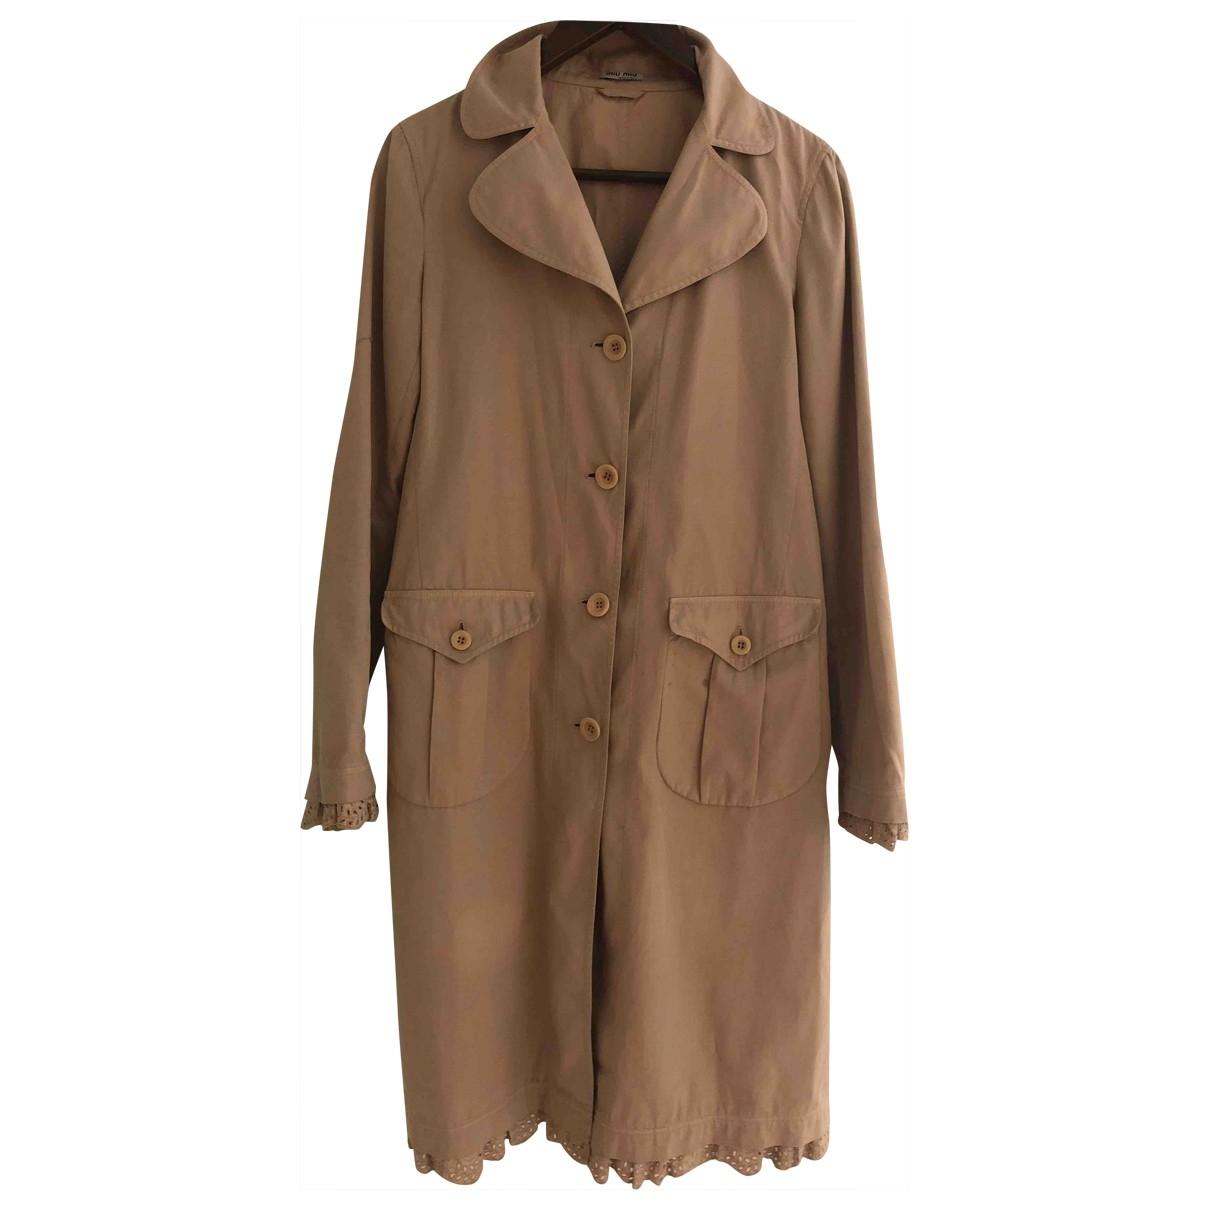 Miu Miu \N Beige Cotton coat for Women 42 IT